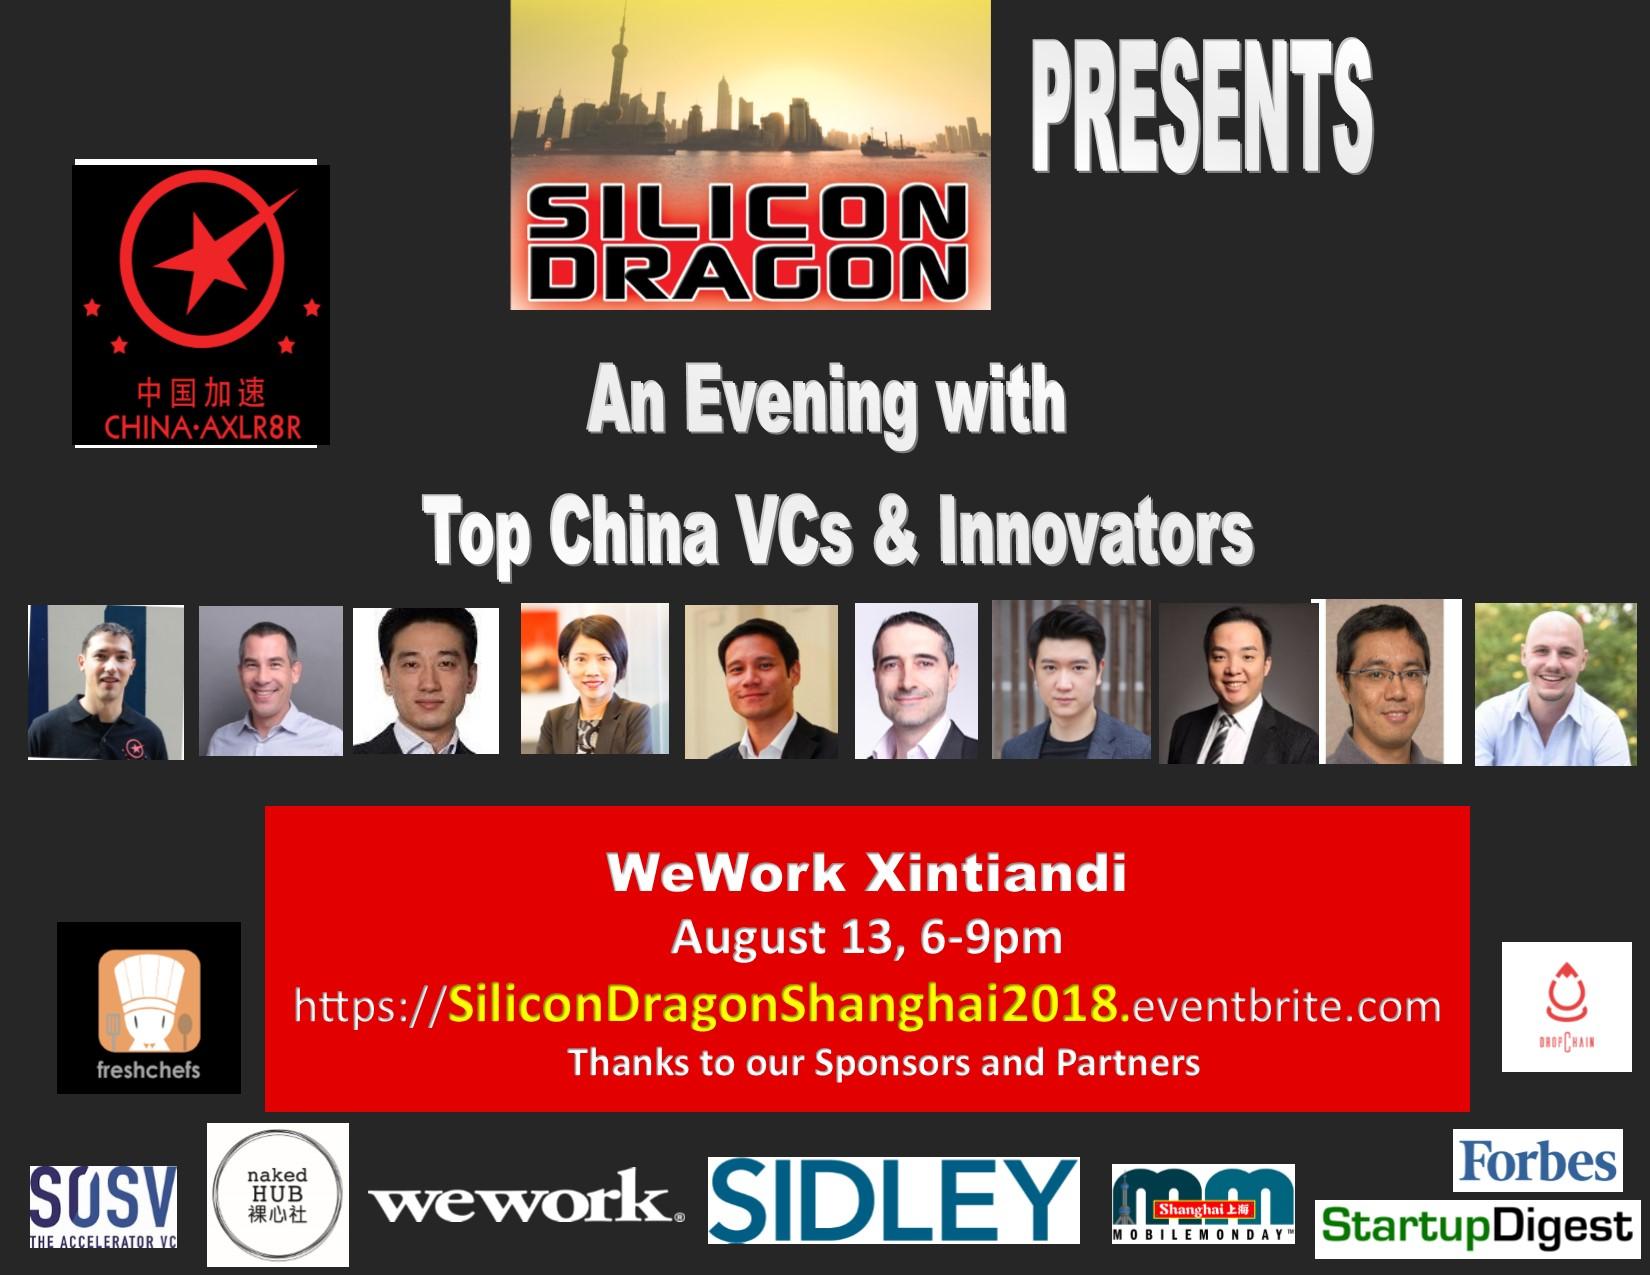 Silicon Dragon Shanghai 2018